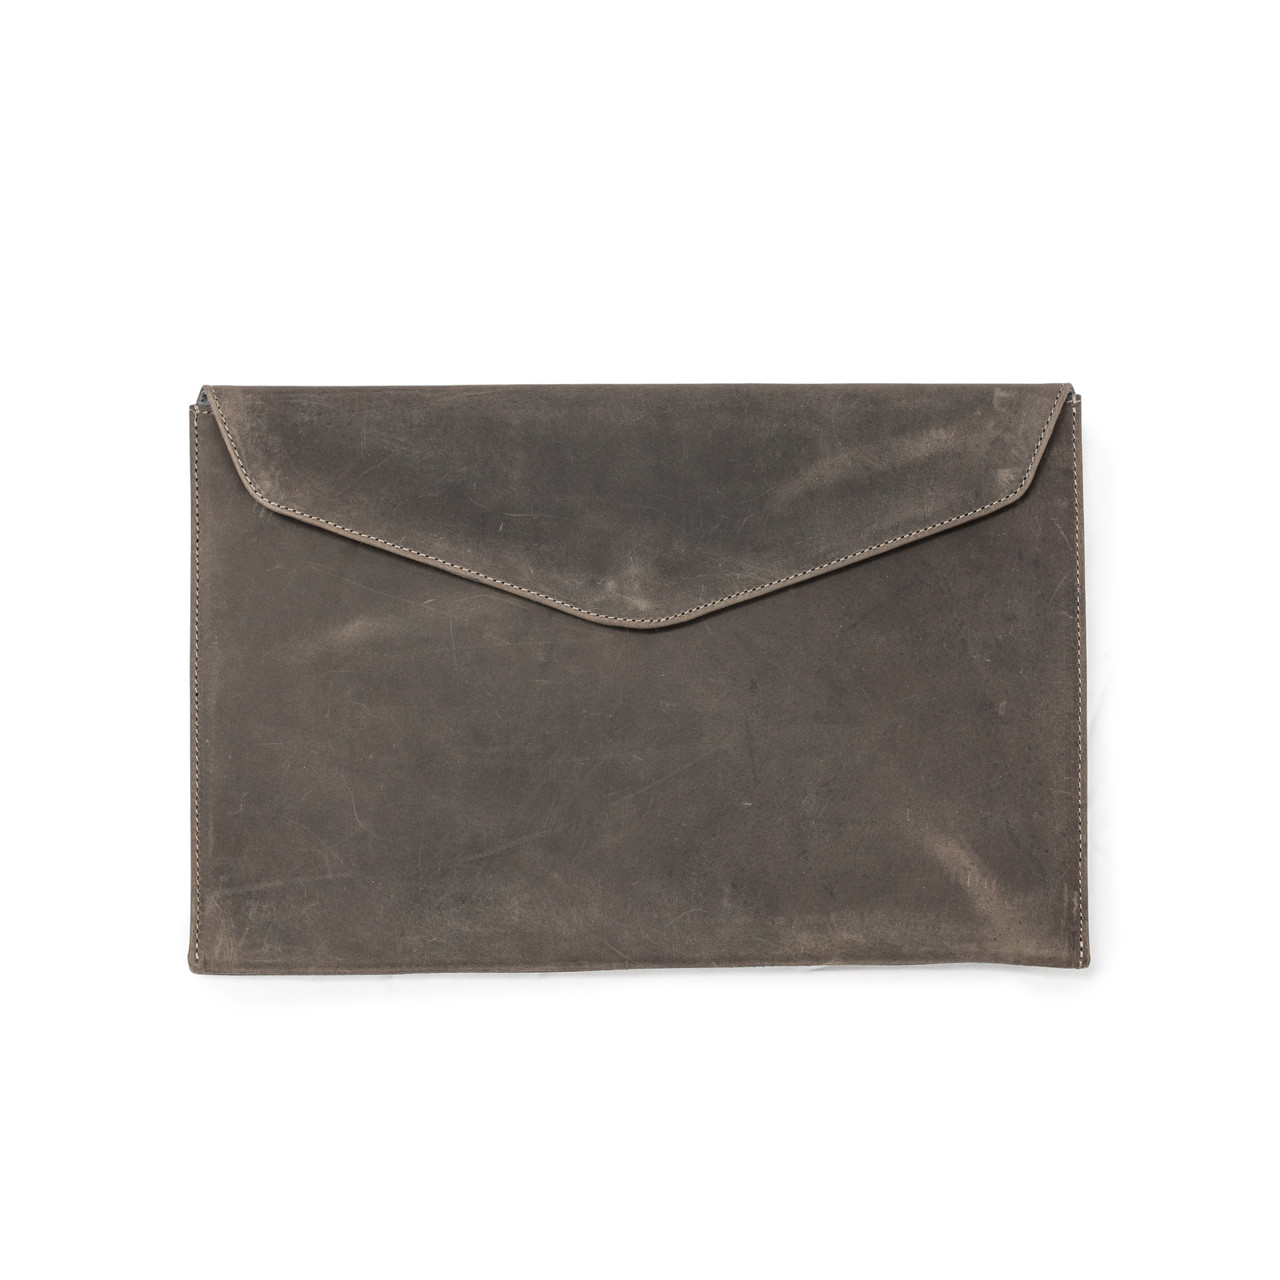 Ash Leather Laptop Case / Computer Sleeve